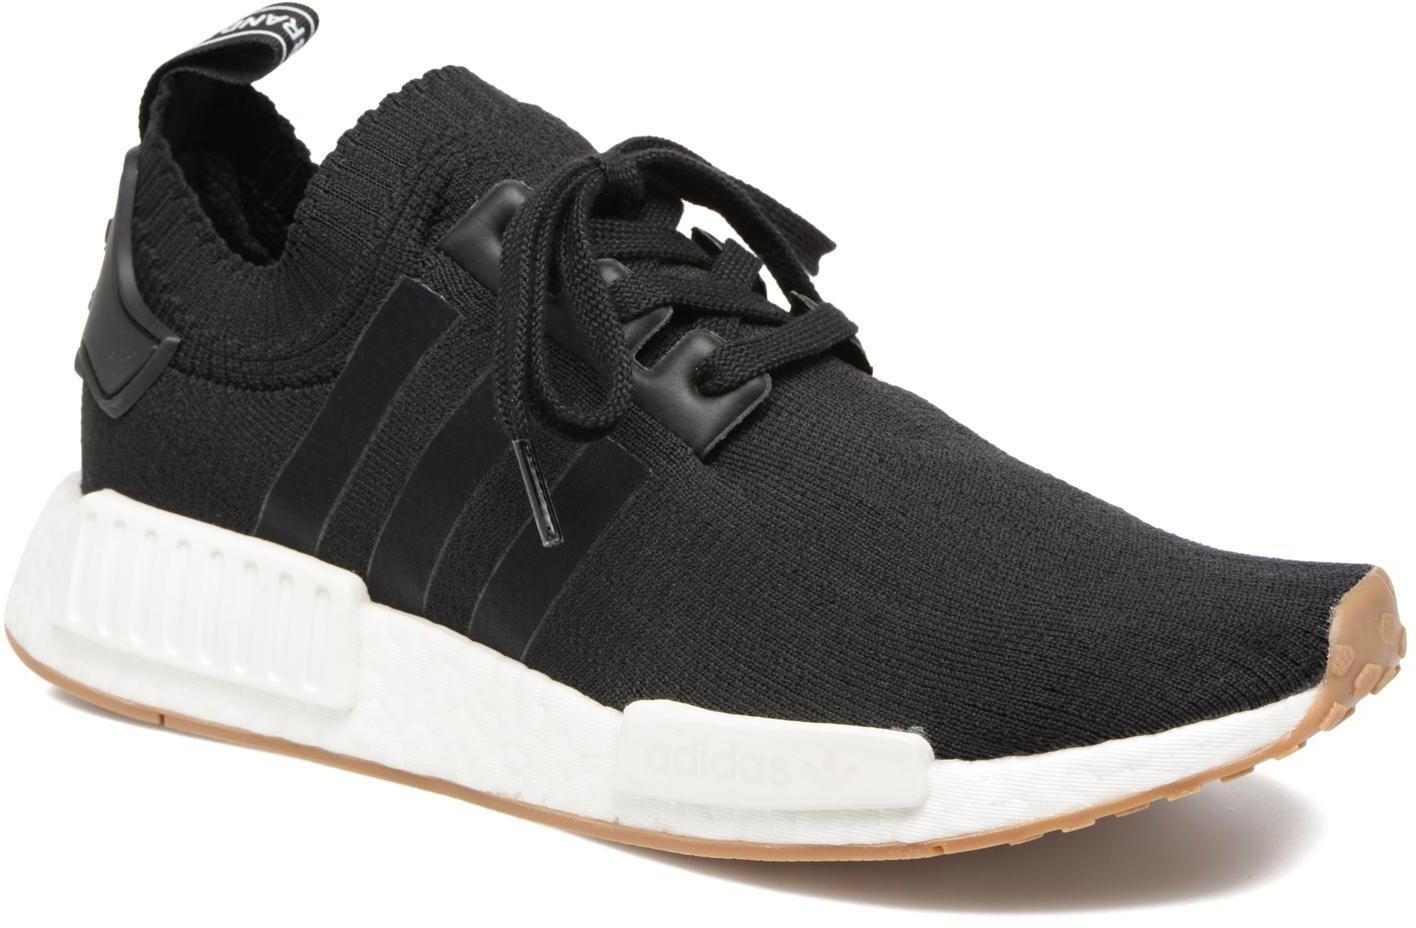 Mode Adidas Turnschuhe | Adidas Nmd R1 Primeknit Schuhe